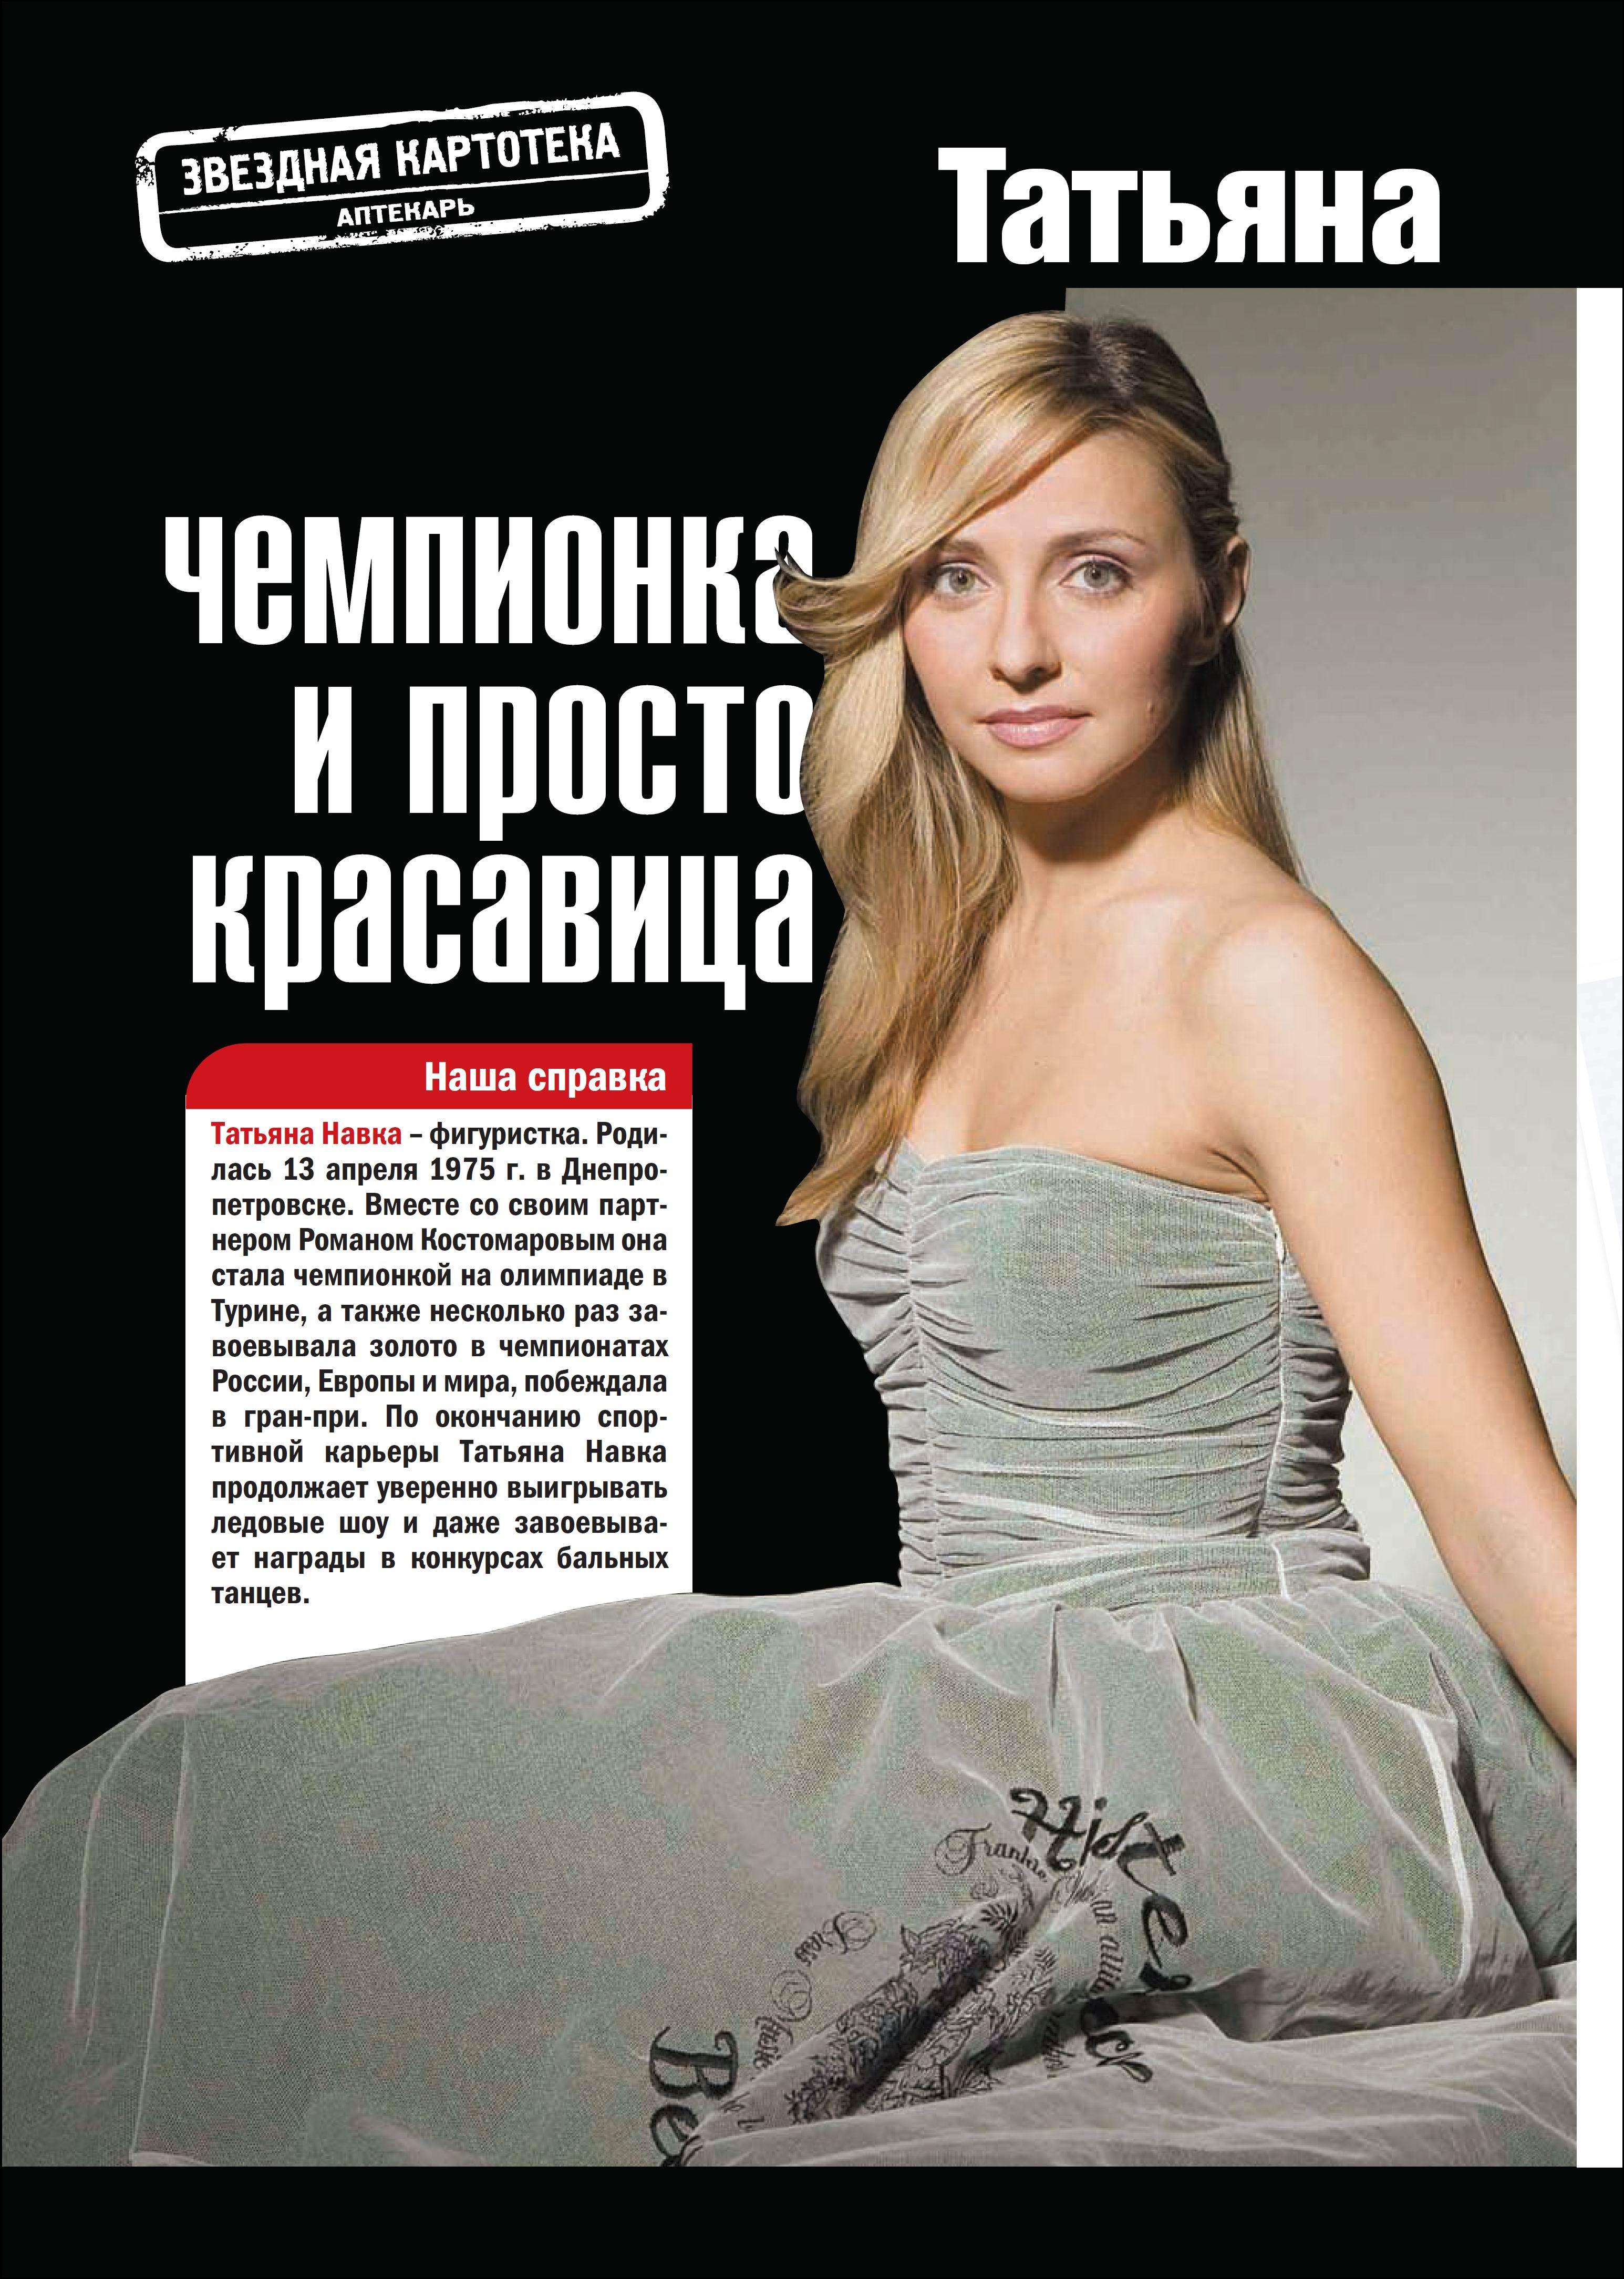 Татьяна Навка. Пресса - Страница 2 SHKgO